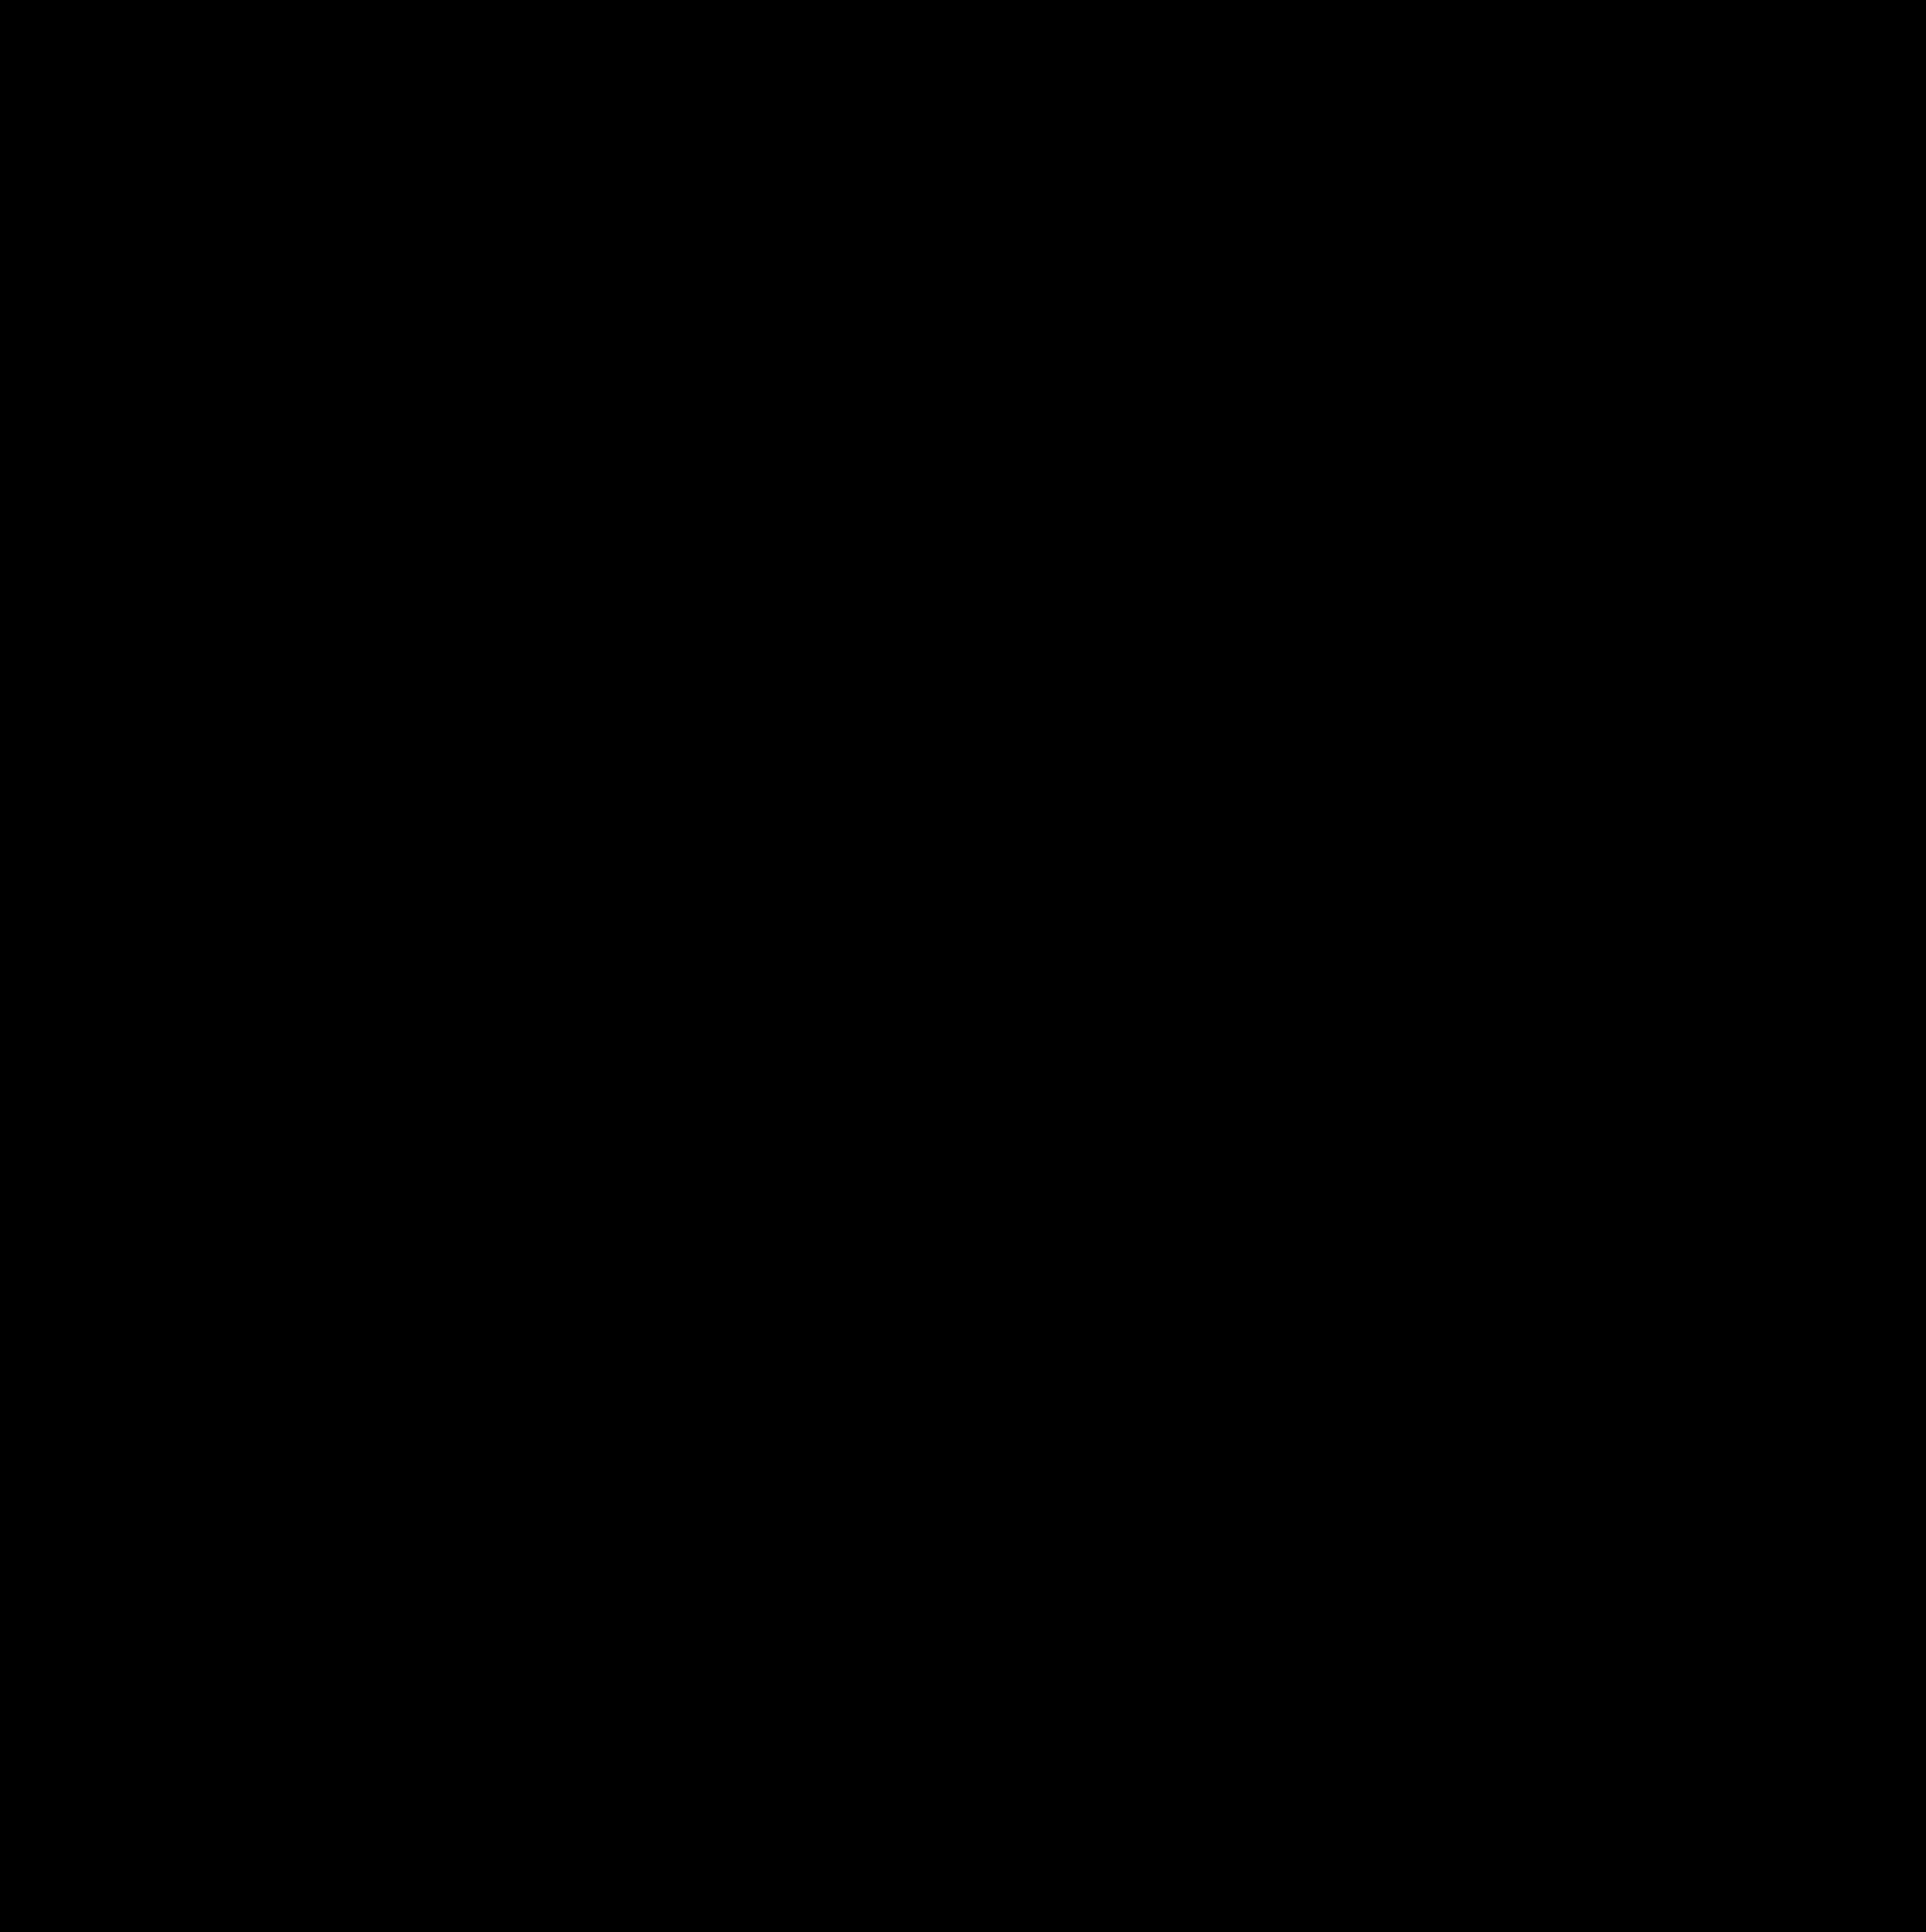 Black And White Monkey Clipart